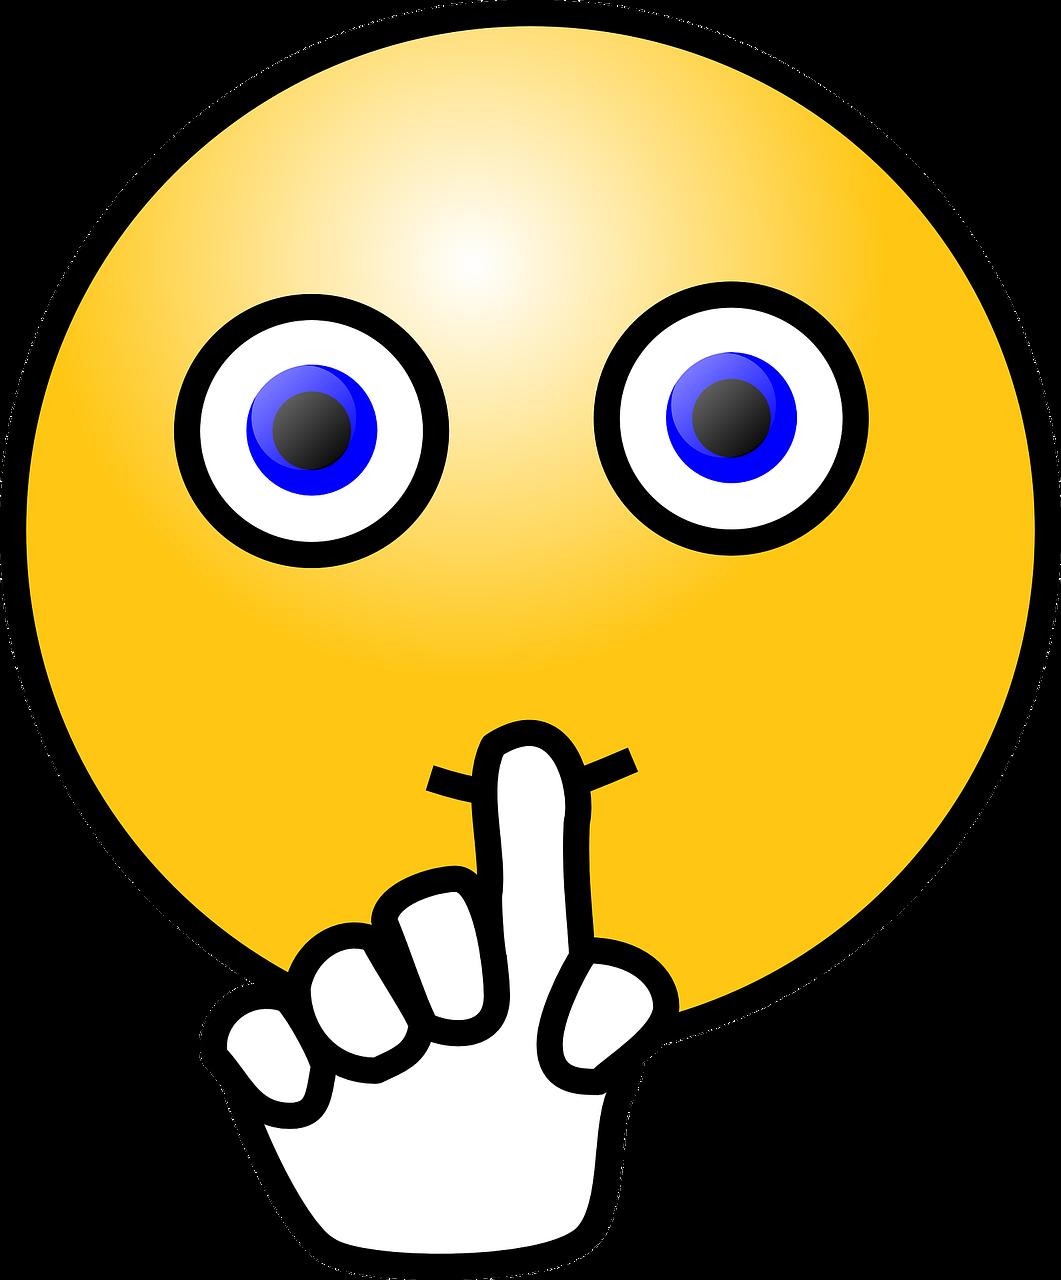 emoticon quite quiet - free vector graphic on pixabay  pixabay